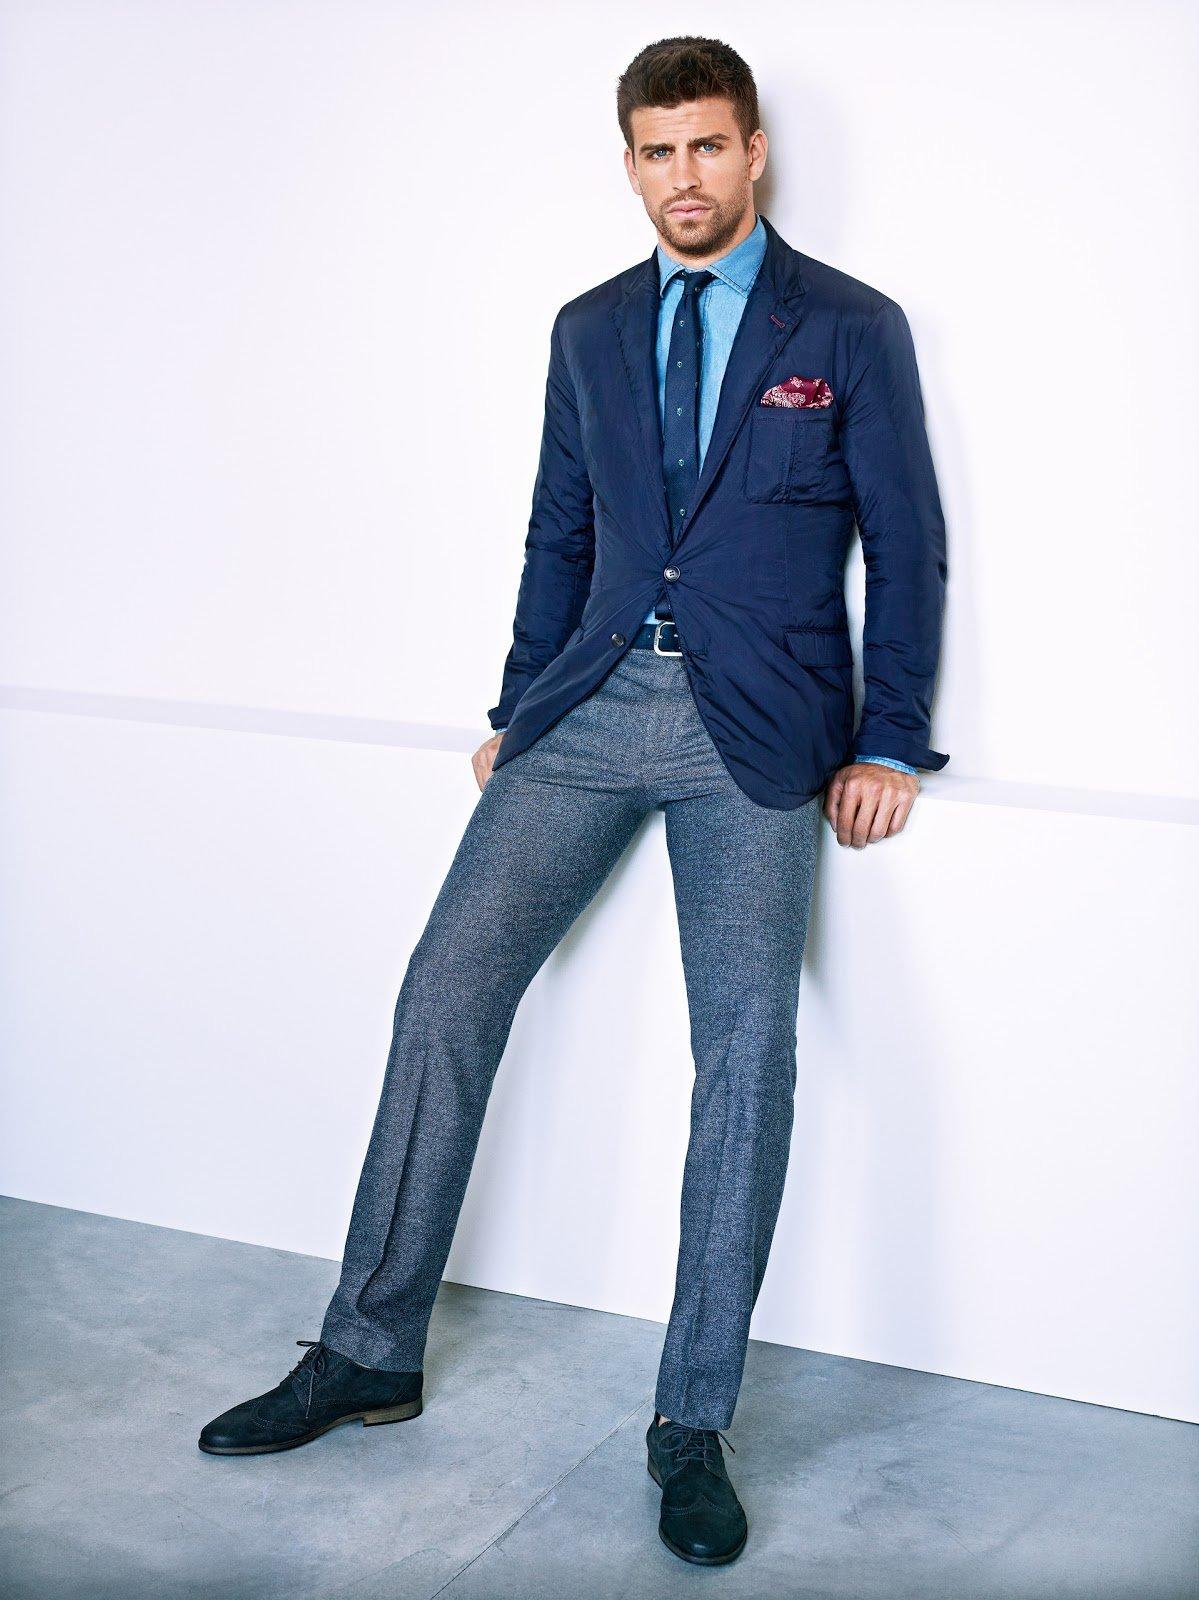 Мужская свадебная мода 2018 тенденции фото